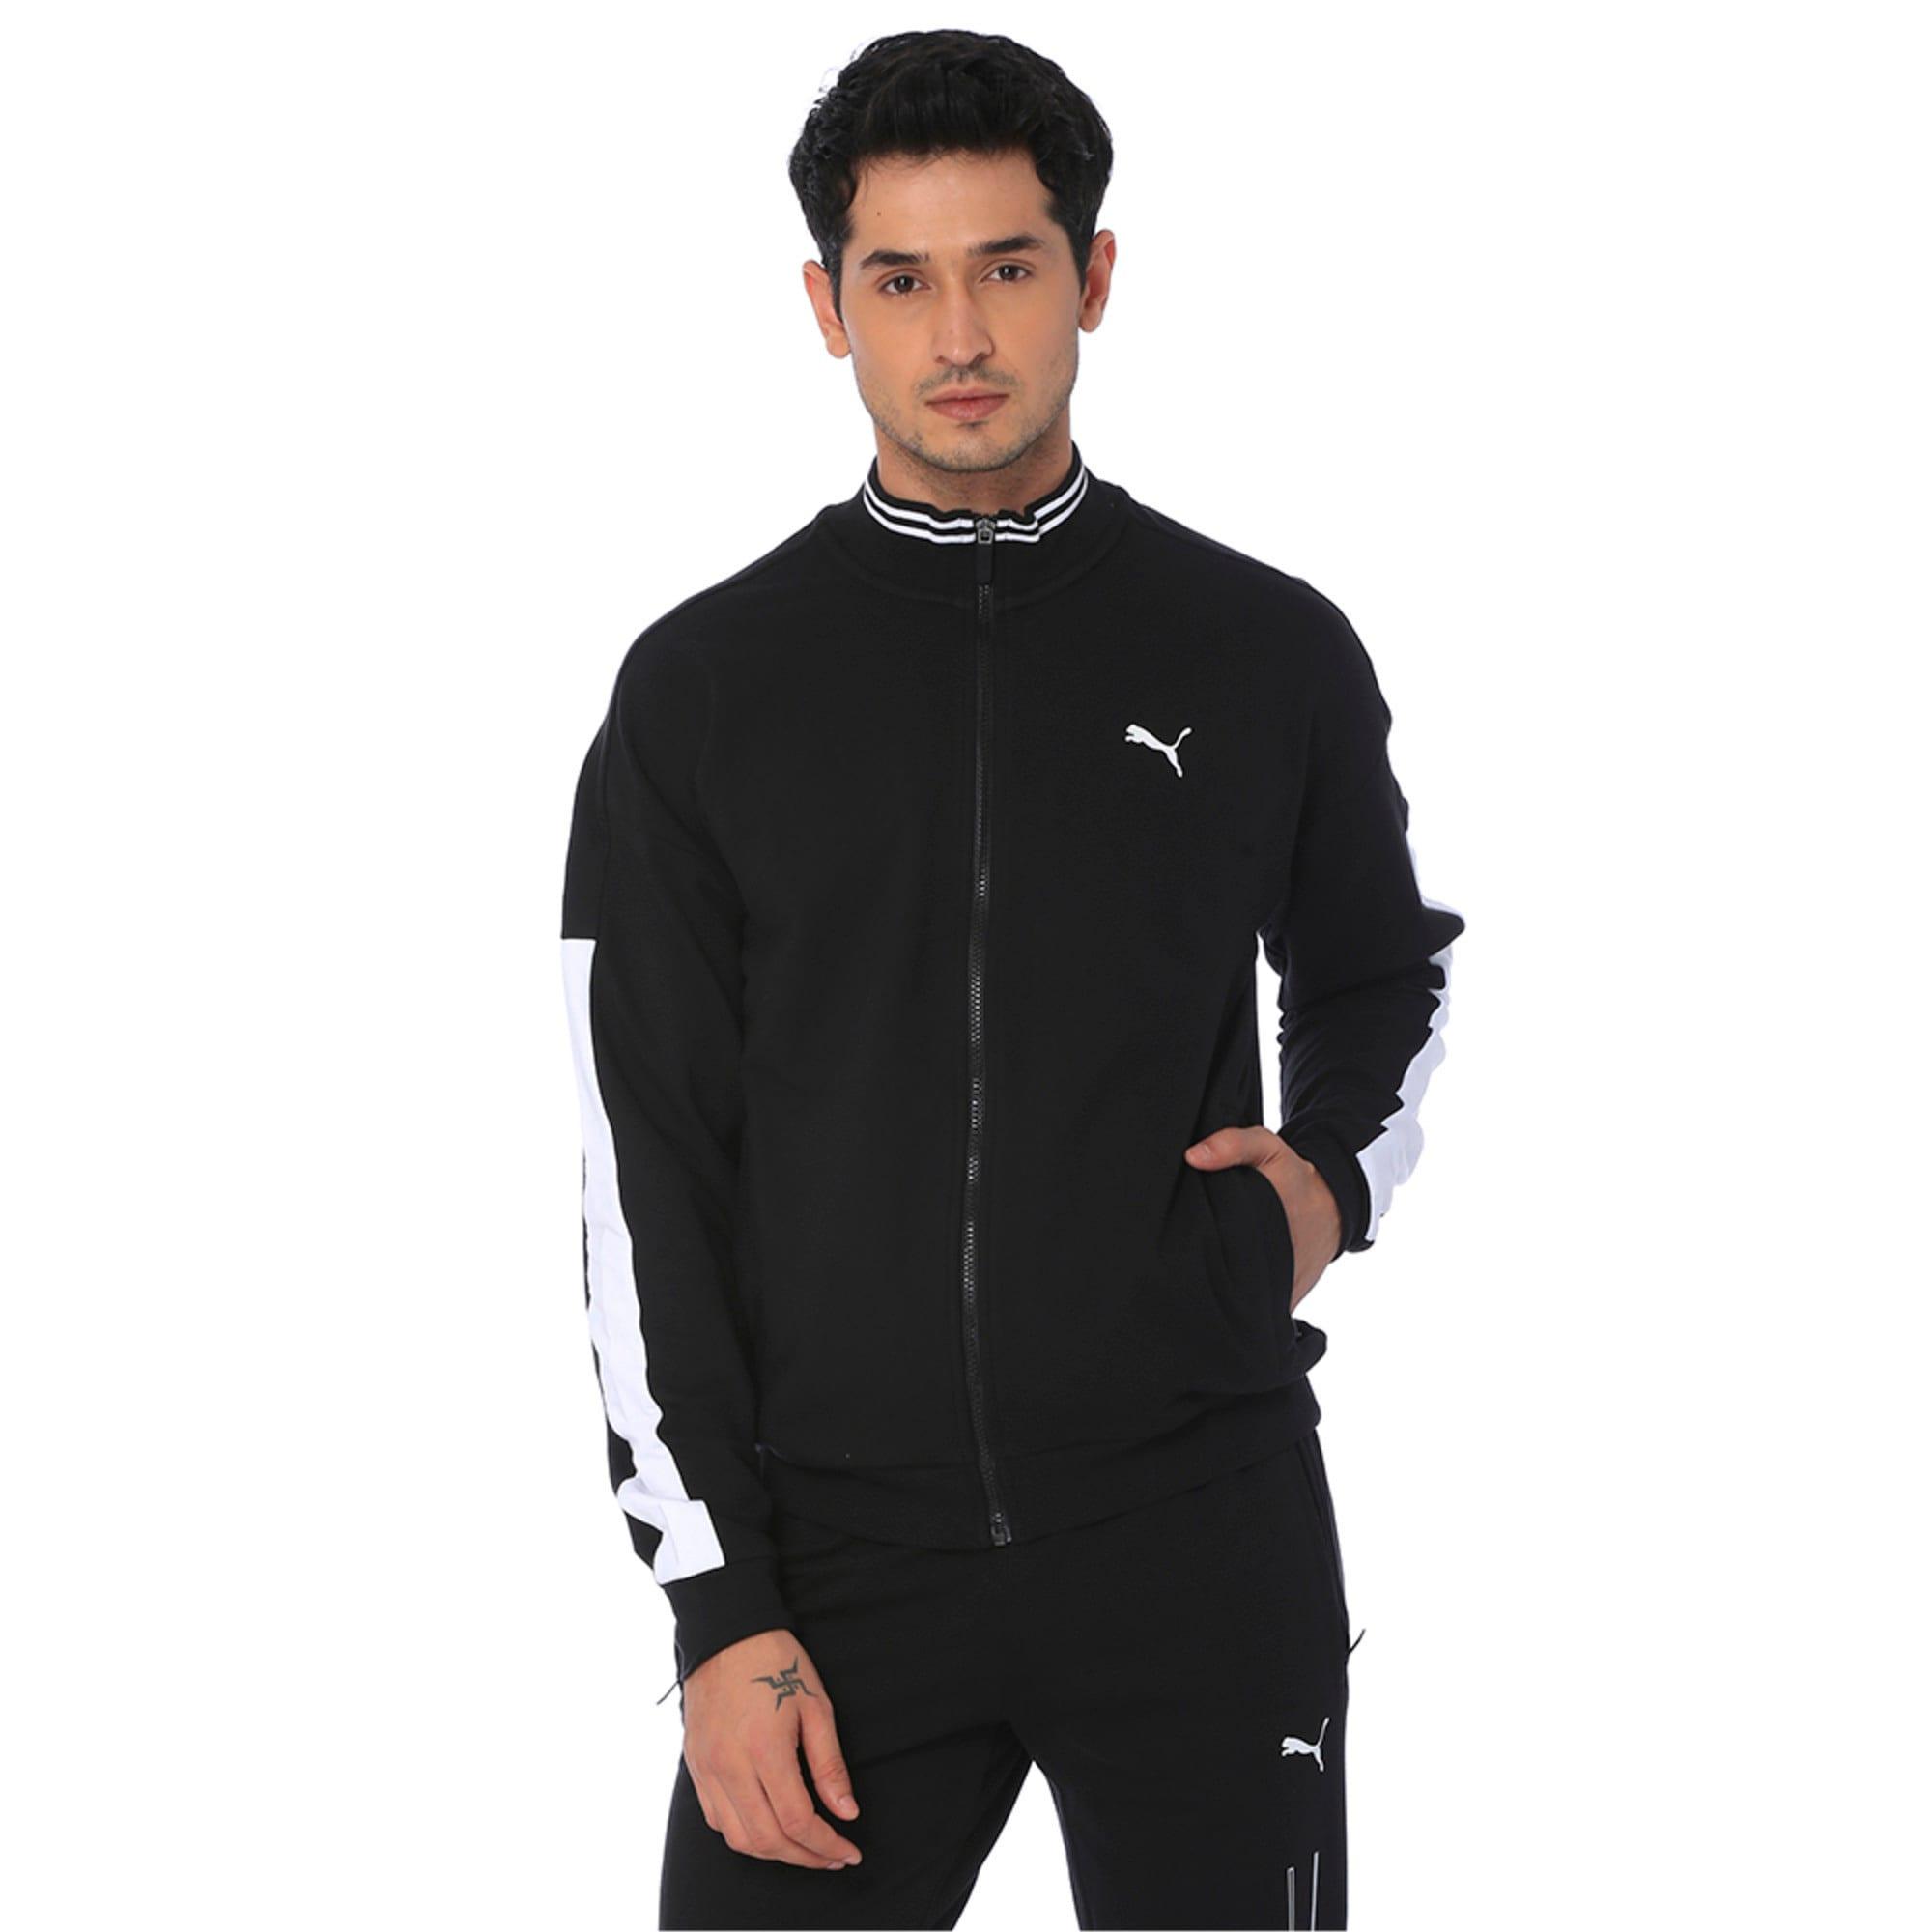 Thumbnail 4 of one8 Men's Knitted Track Jacket, Puma Black, medium-IND